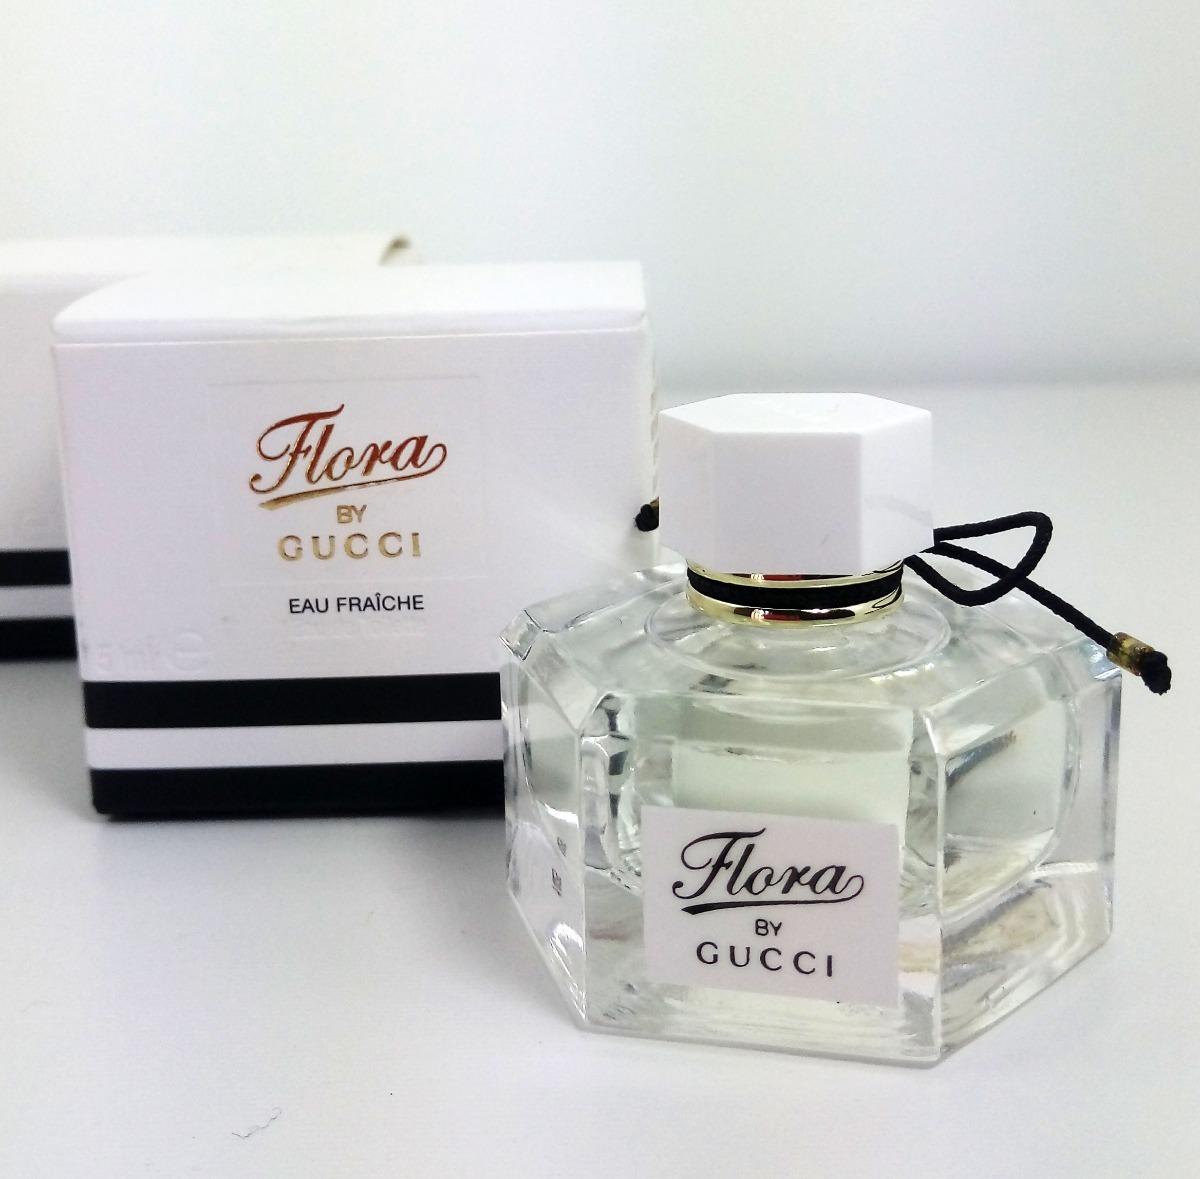 4ad02bdda miniatura perfume gucci flora by gucci feminino original 5ml. Carregando  zoom.